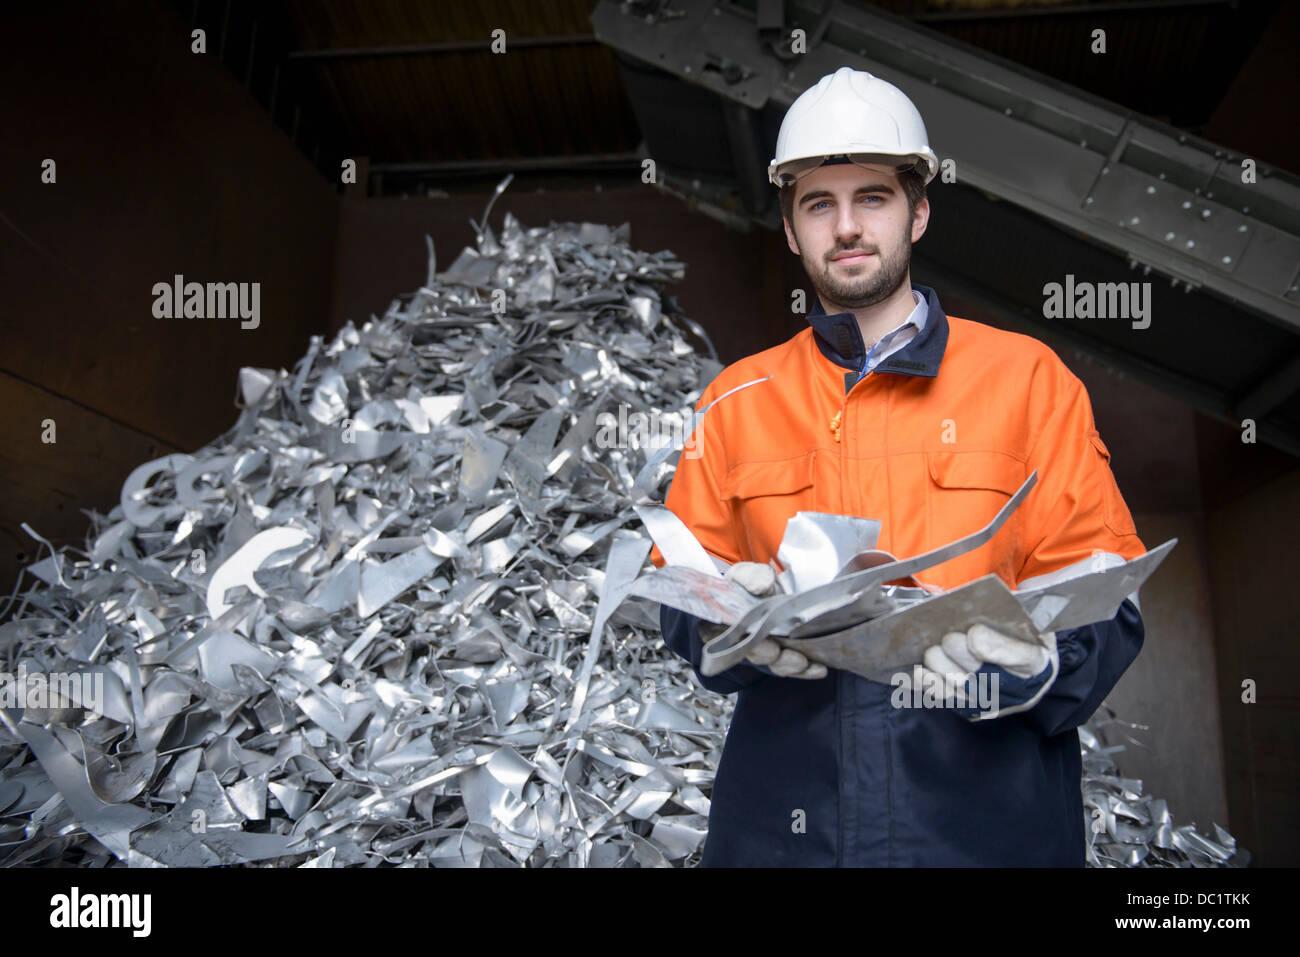 Portrait of worker holding scrap aluminum - Stock Image